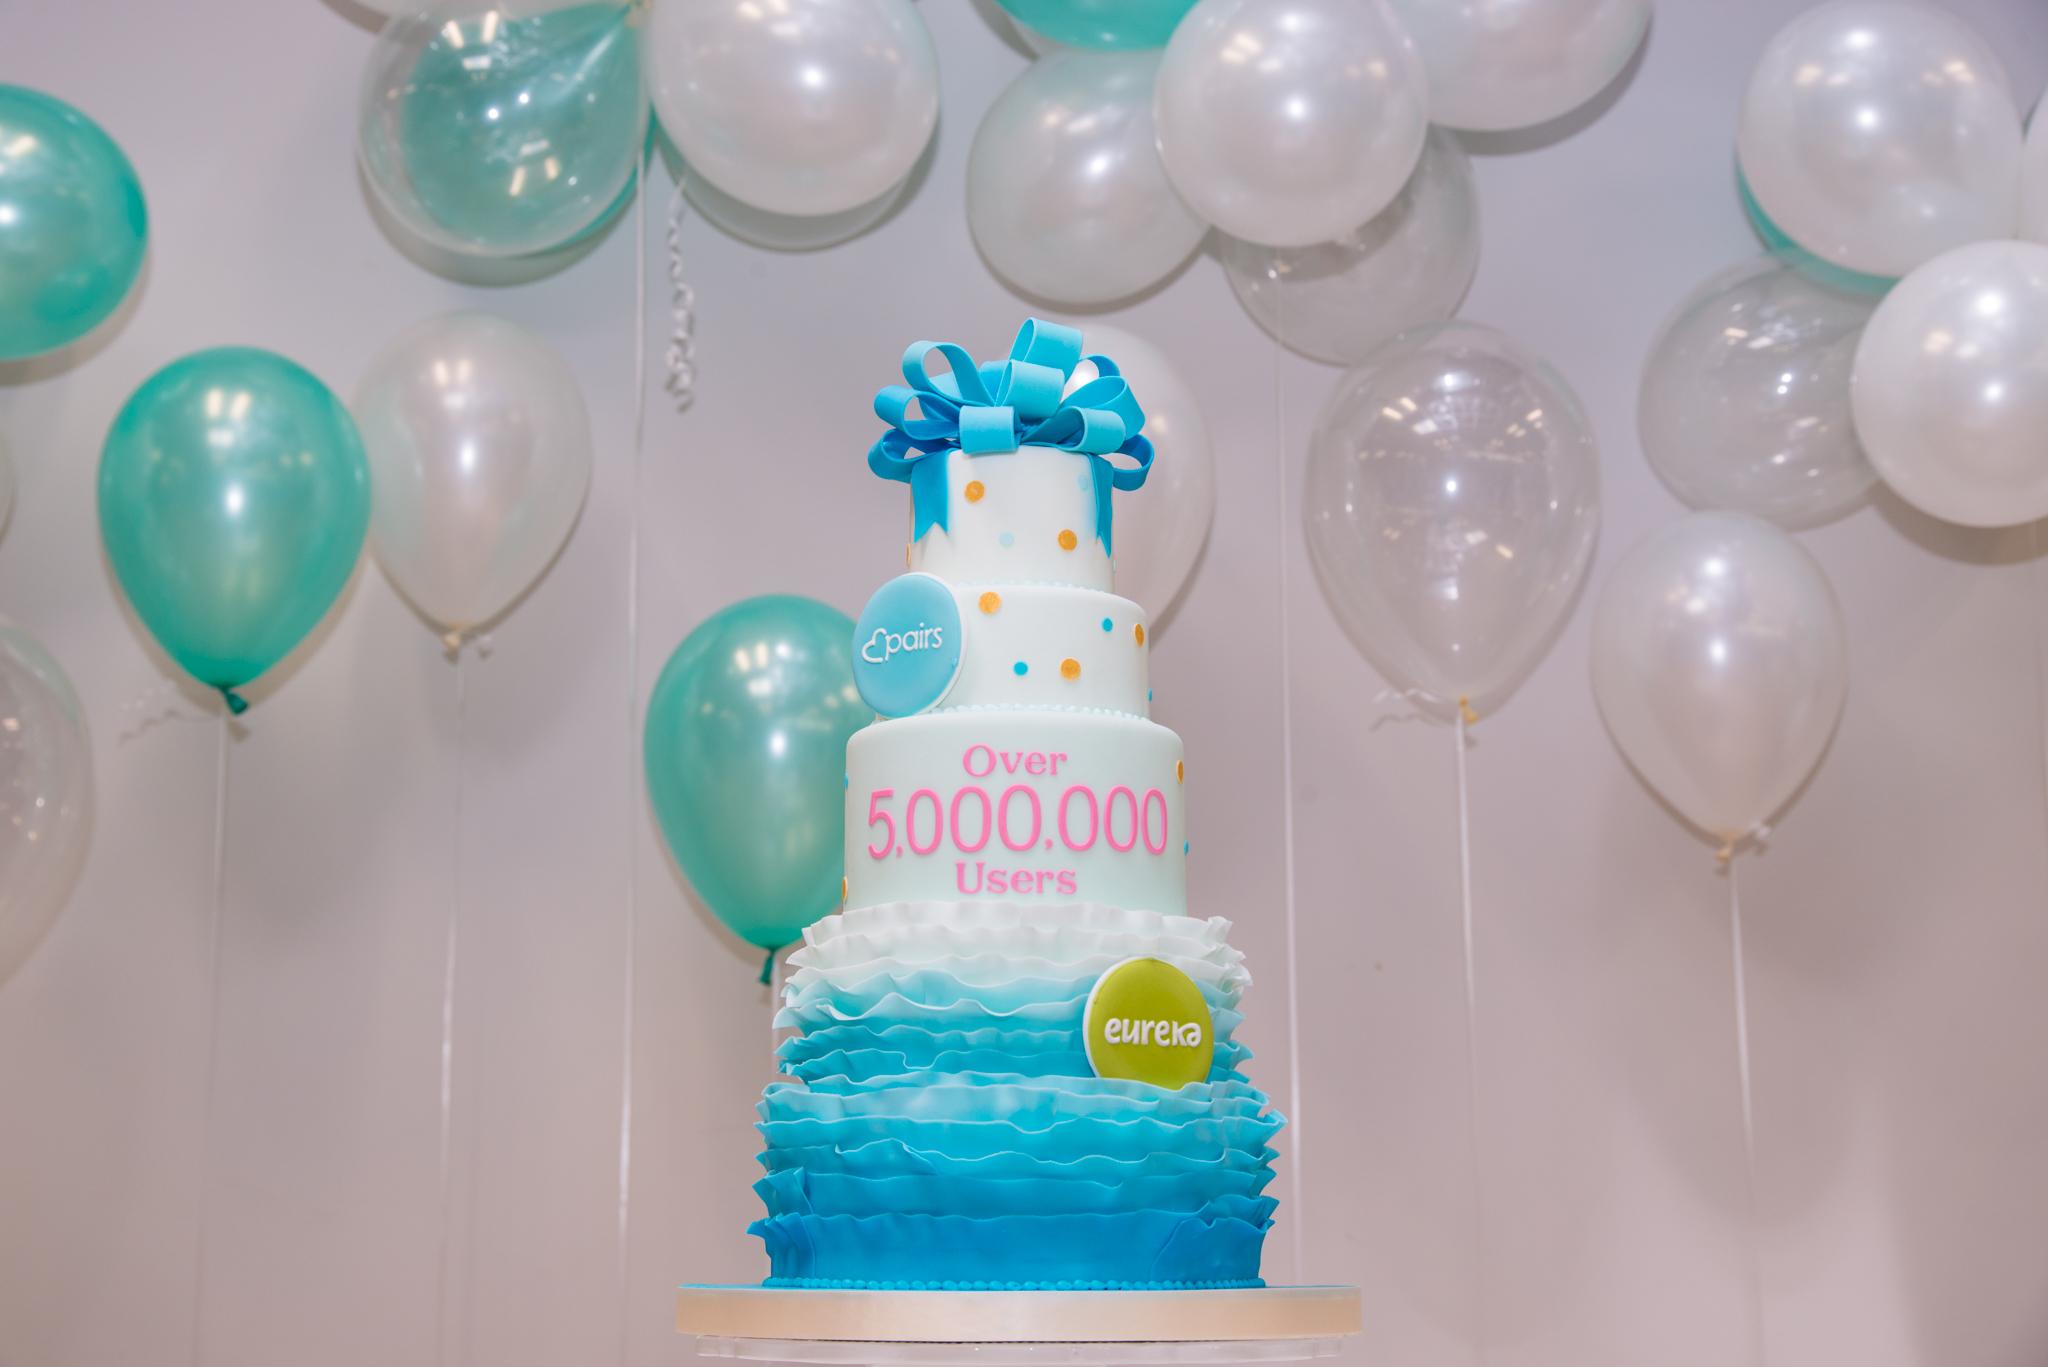 CAKEBY Pairs 5million Users Cake